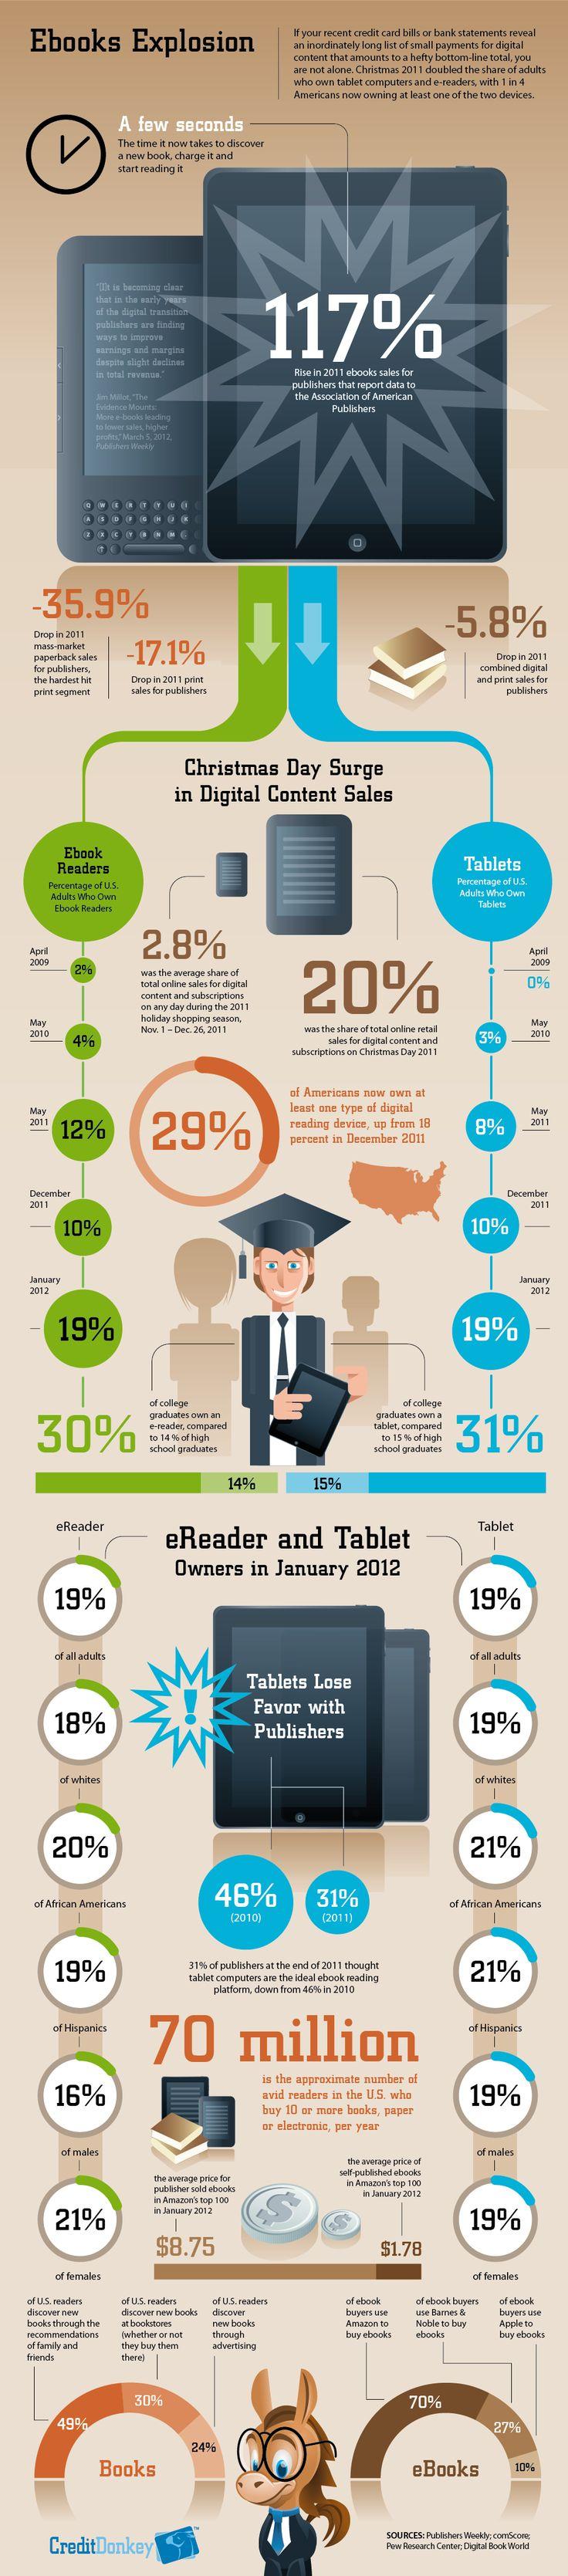 Ebooks explosion #infographic